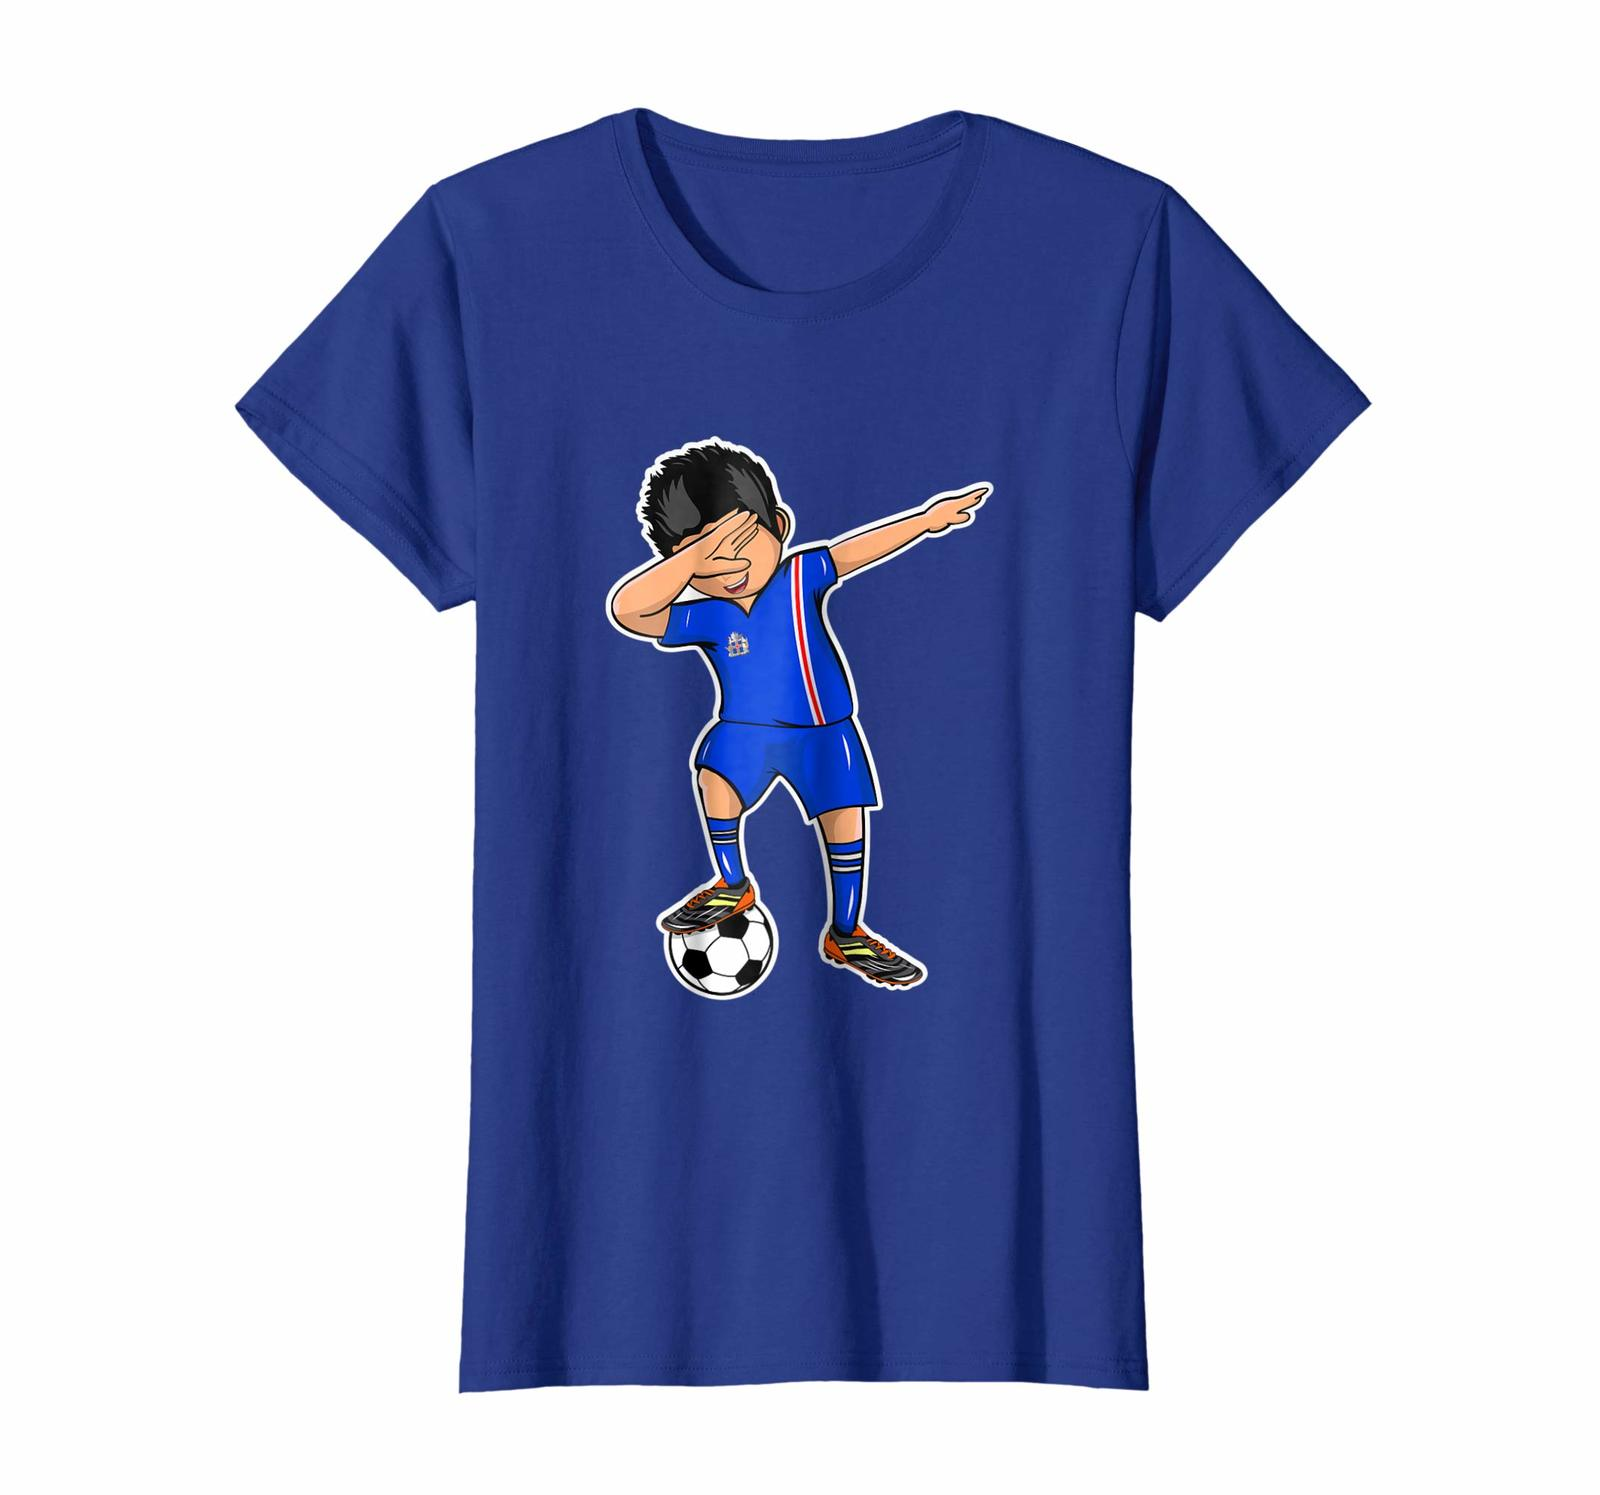 New Shirts - Dabbing Soccer Boy Iceland Jersey T Shirt Football Fan Wowen image 3